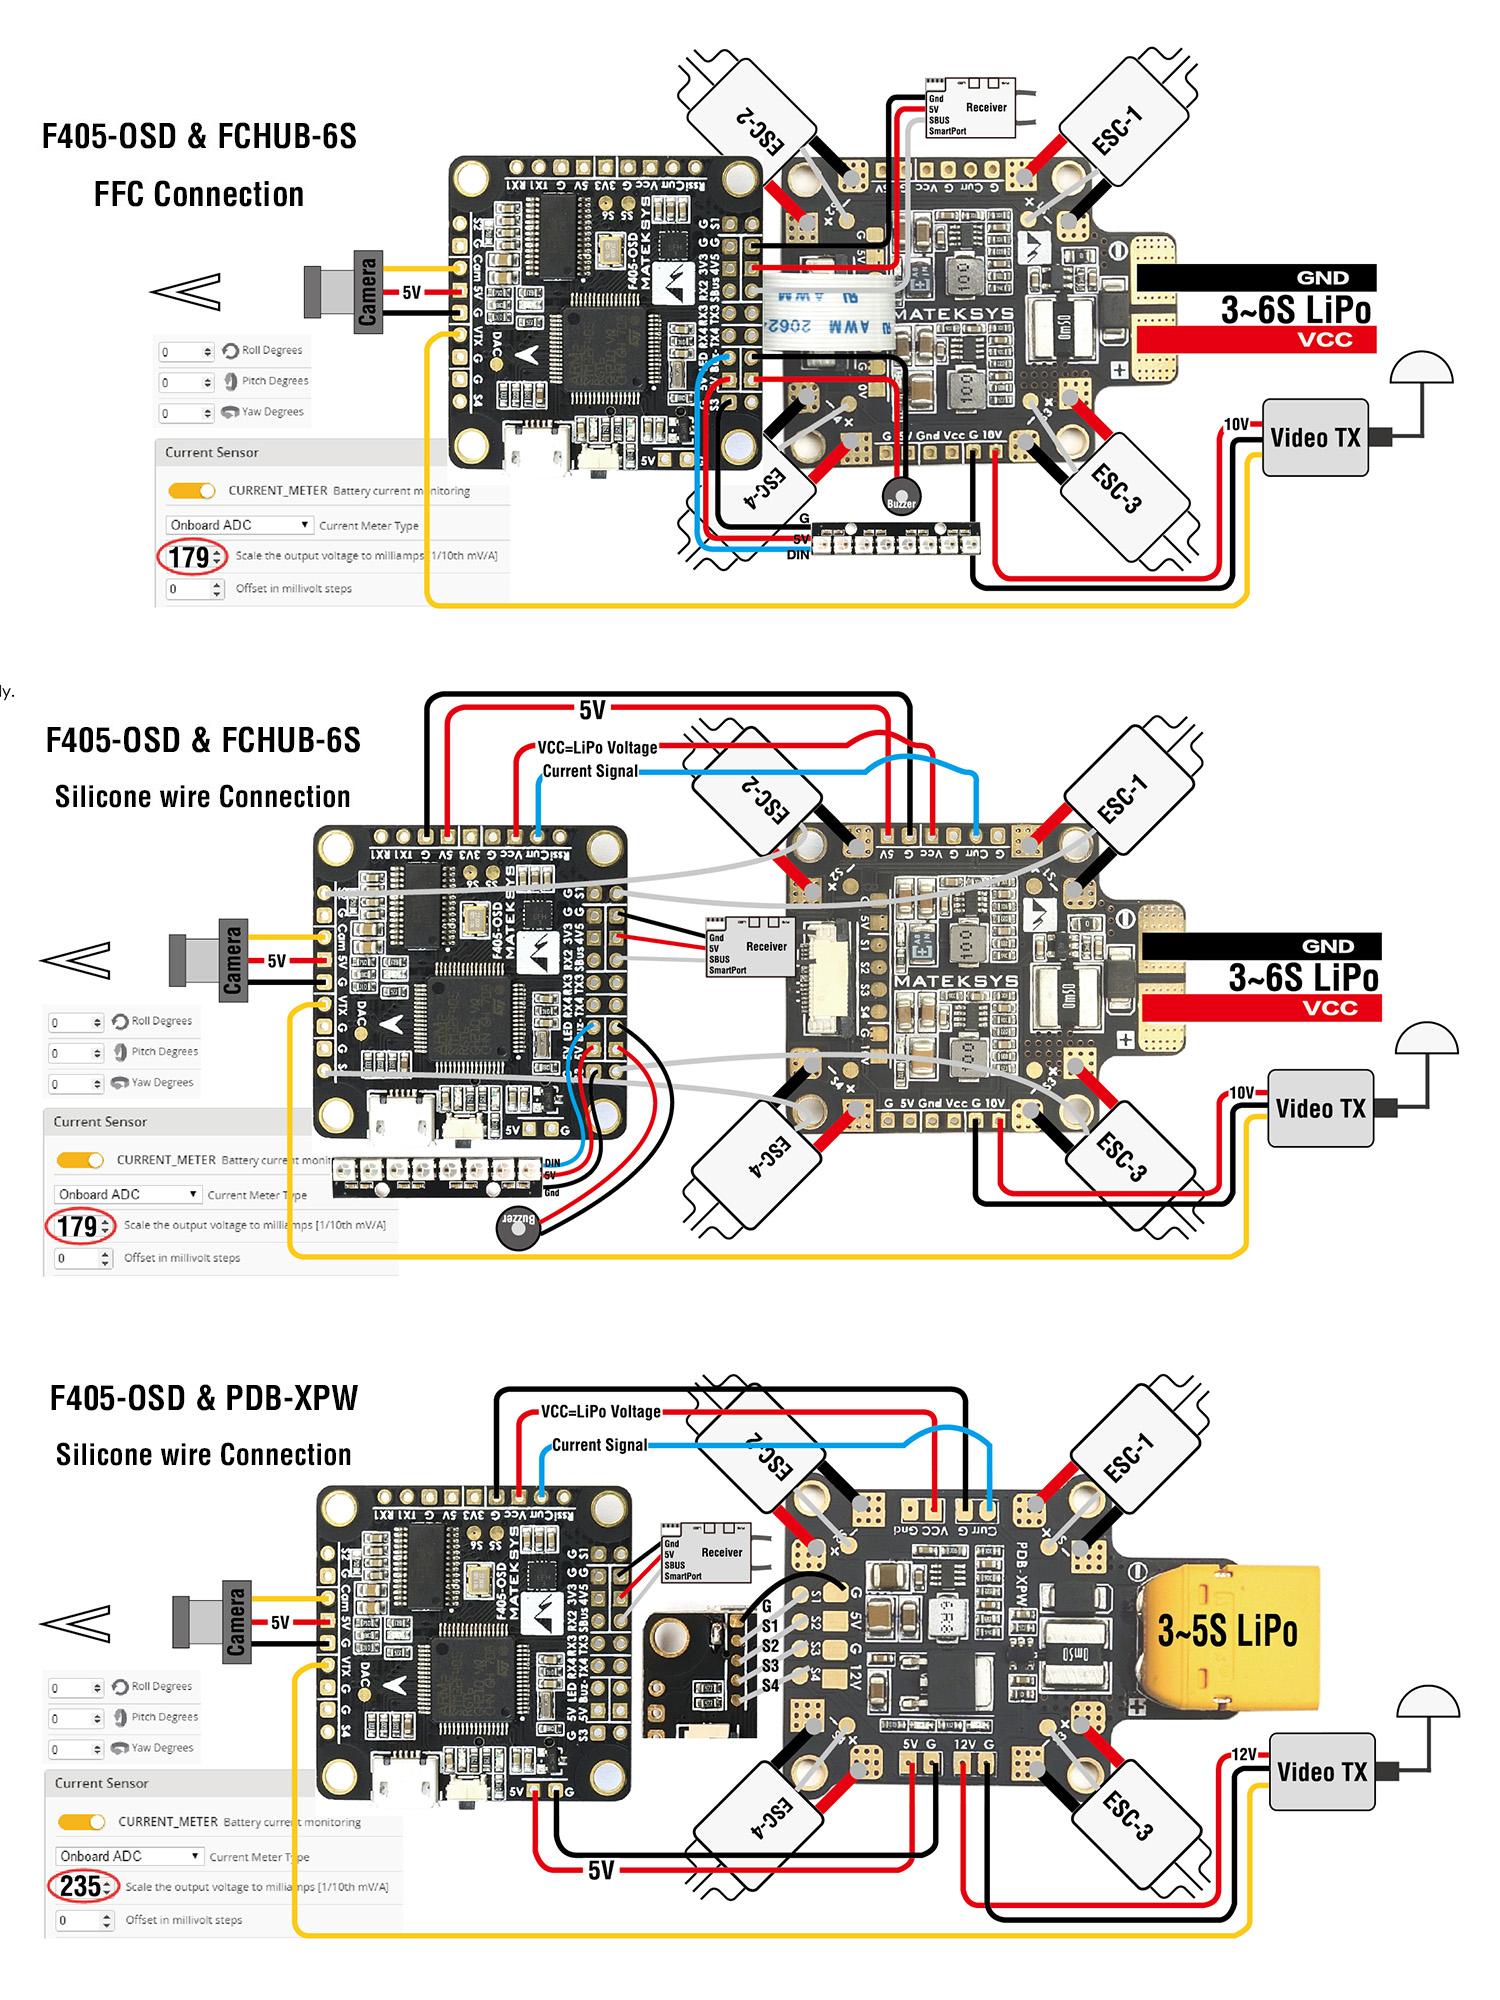 Hn 6893 Bar Wiring Diagram Besides Whelen Siren Wiring Diagram Further Whelen Download Diagram